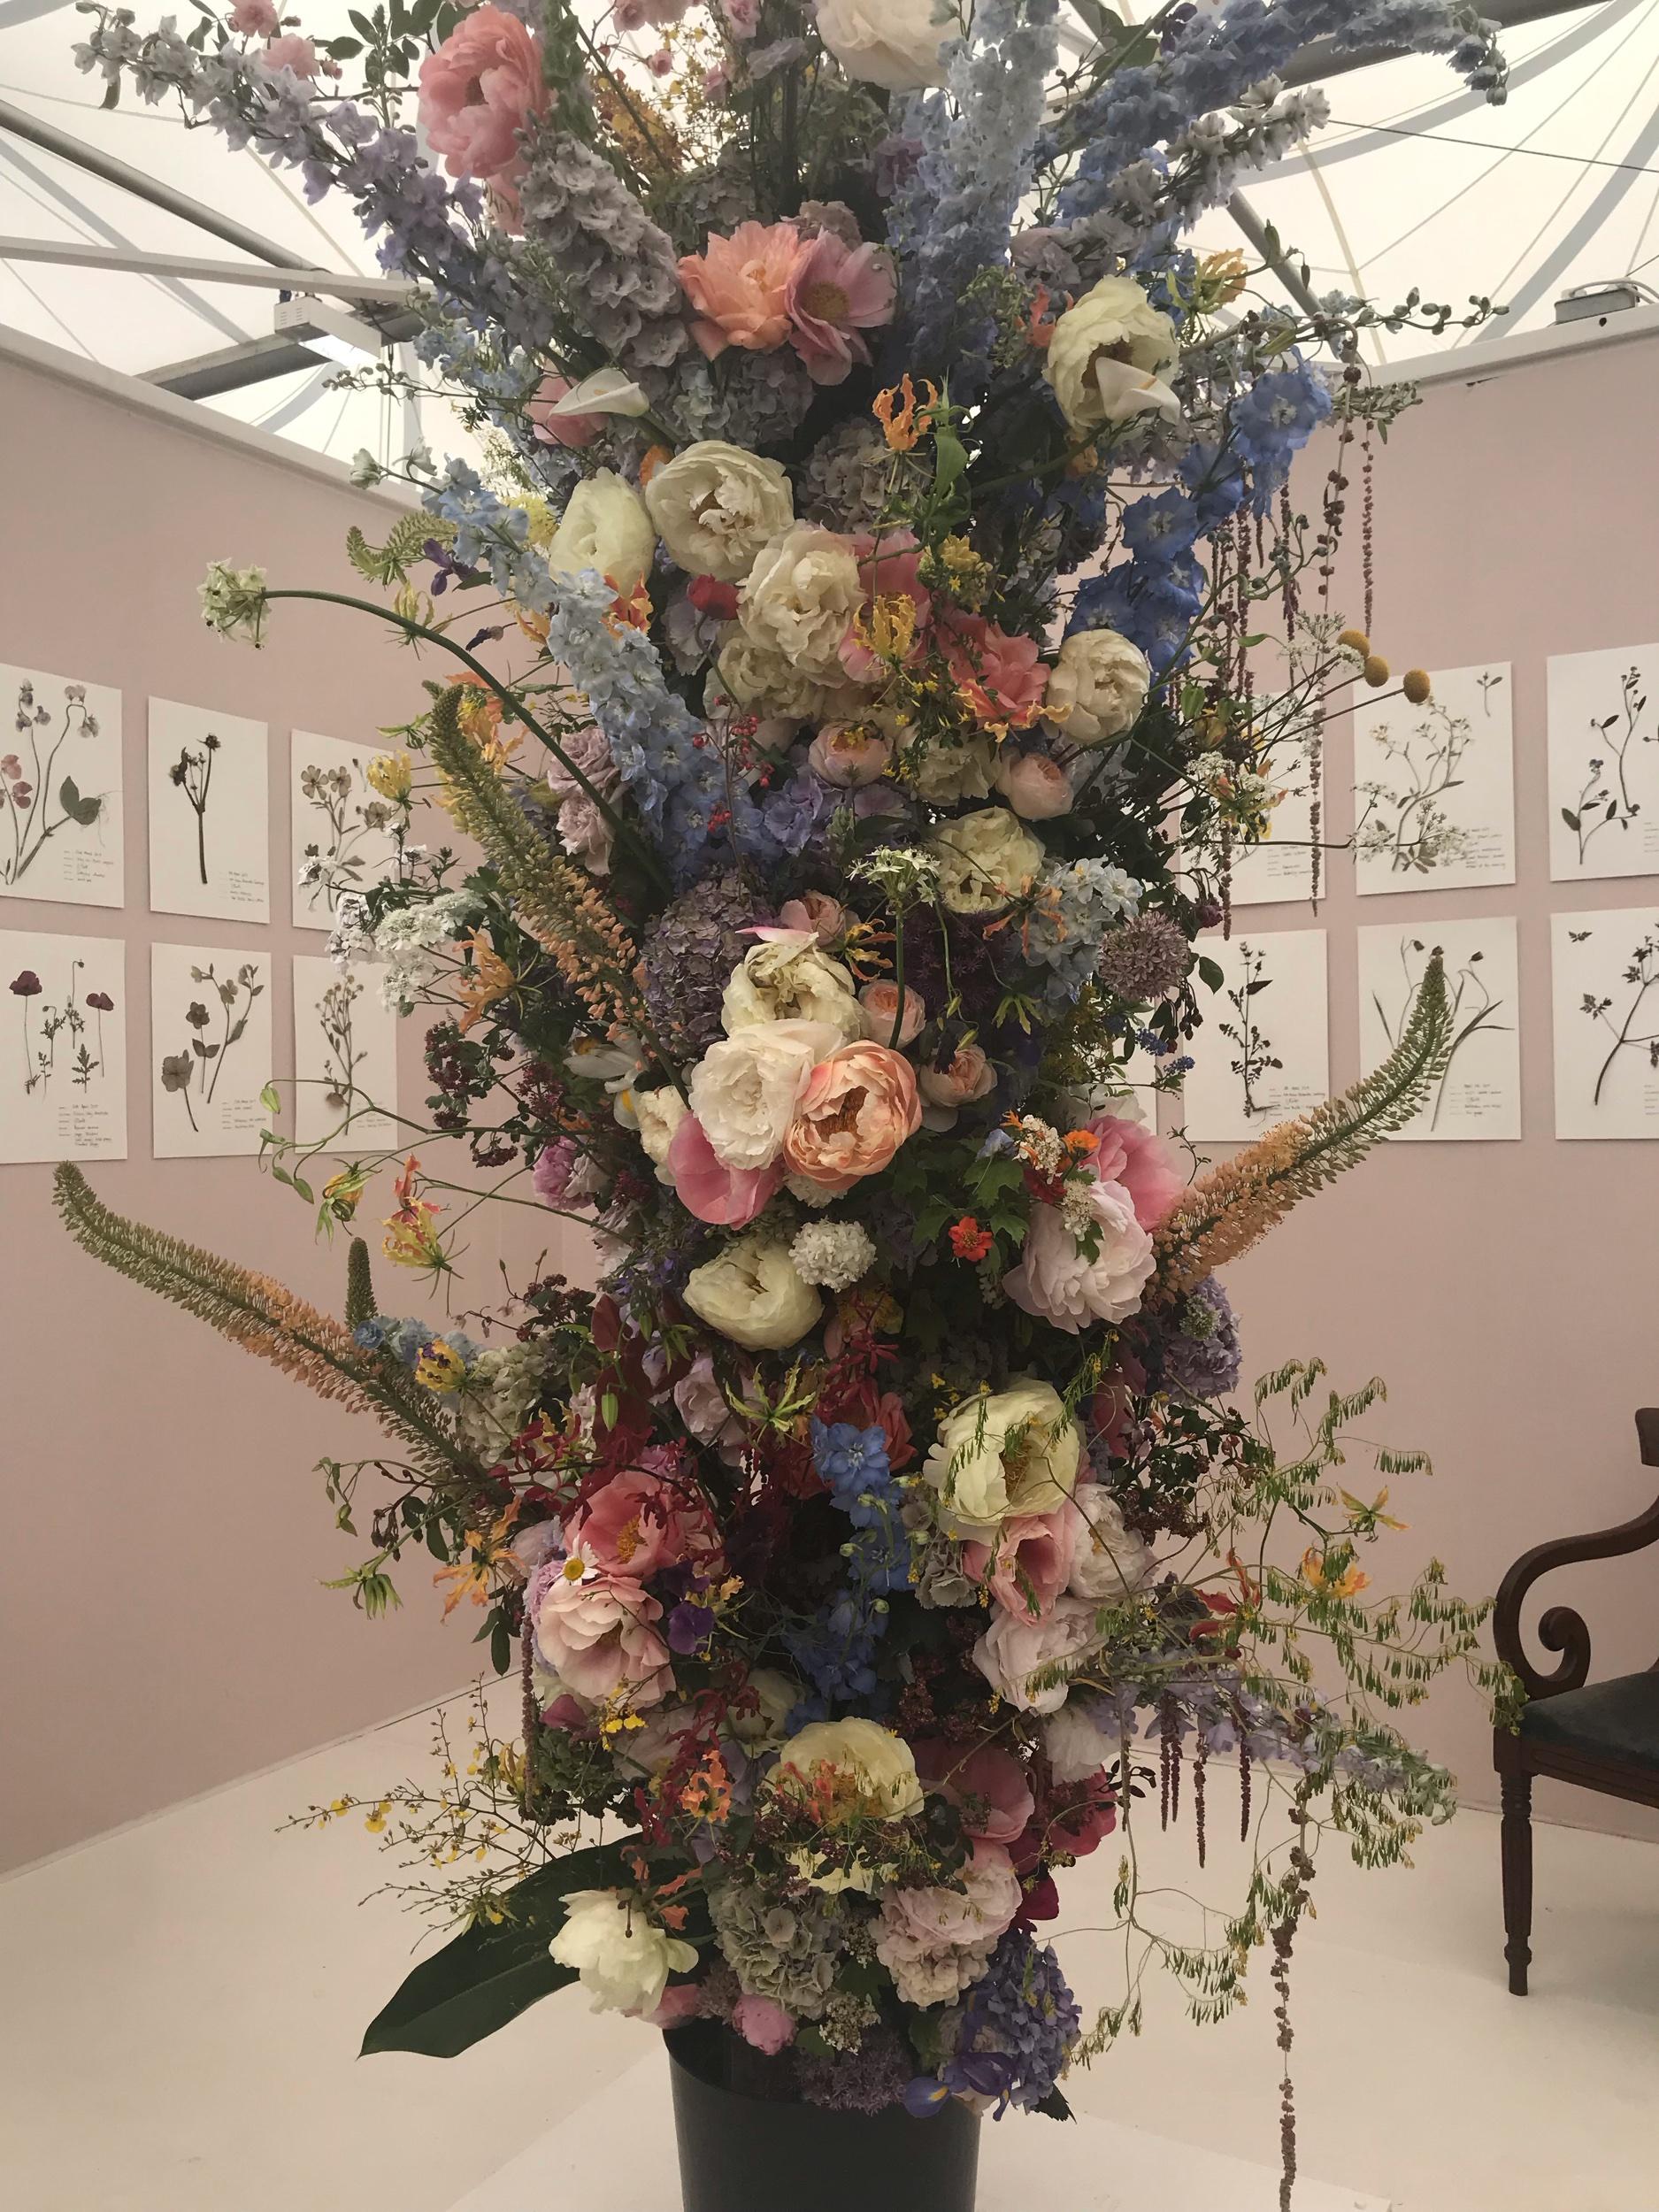 Living Herbarium by Gail Smith